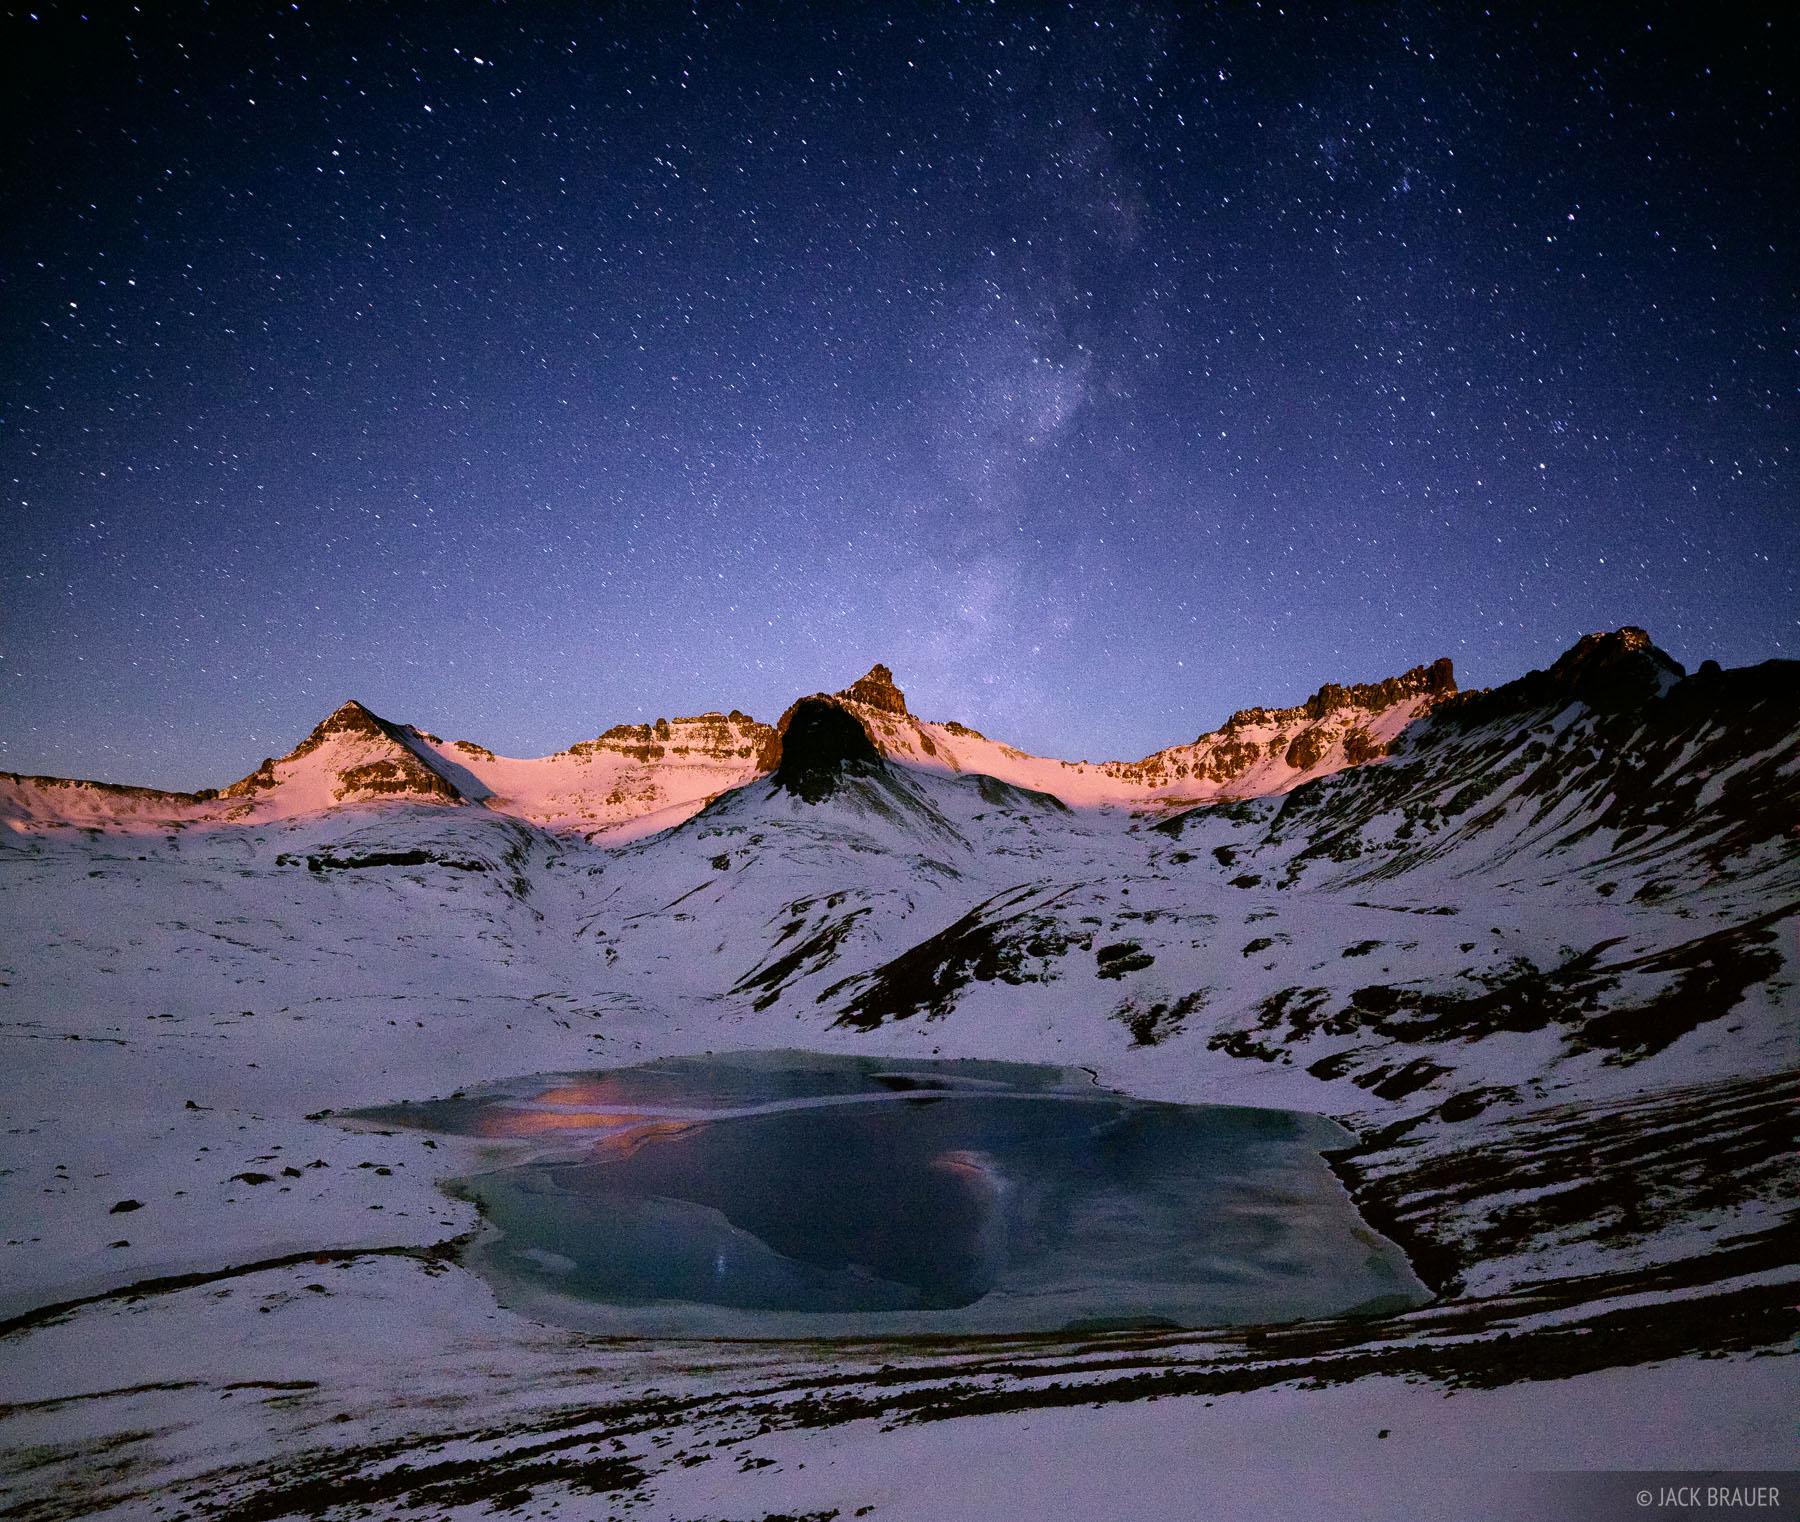 lunar alpenglow, moonlight, Ice Lakes Basin, Colorado, alpenglow, stars, photo